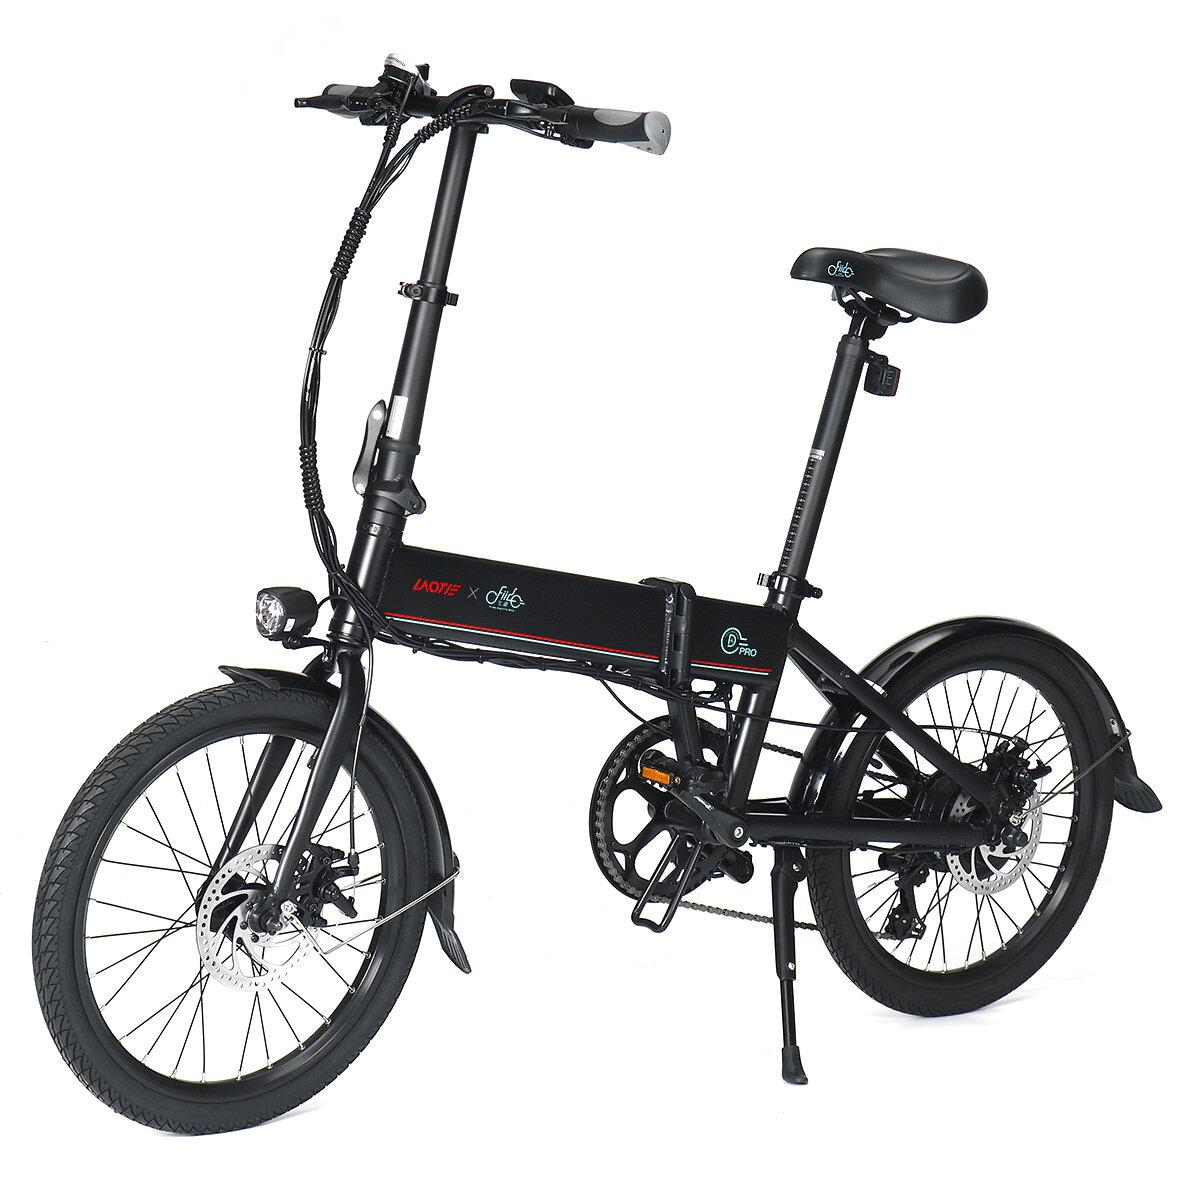 [CZ Direct] LAOTIE X FIIDO D4s Pro 11.6Ah 36V 250W 20in Folding Moped Bicycle 25km/h Top Speed 90KM Mileage Range Electric Bike